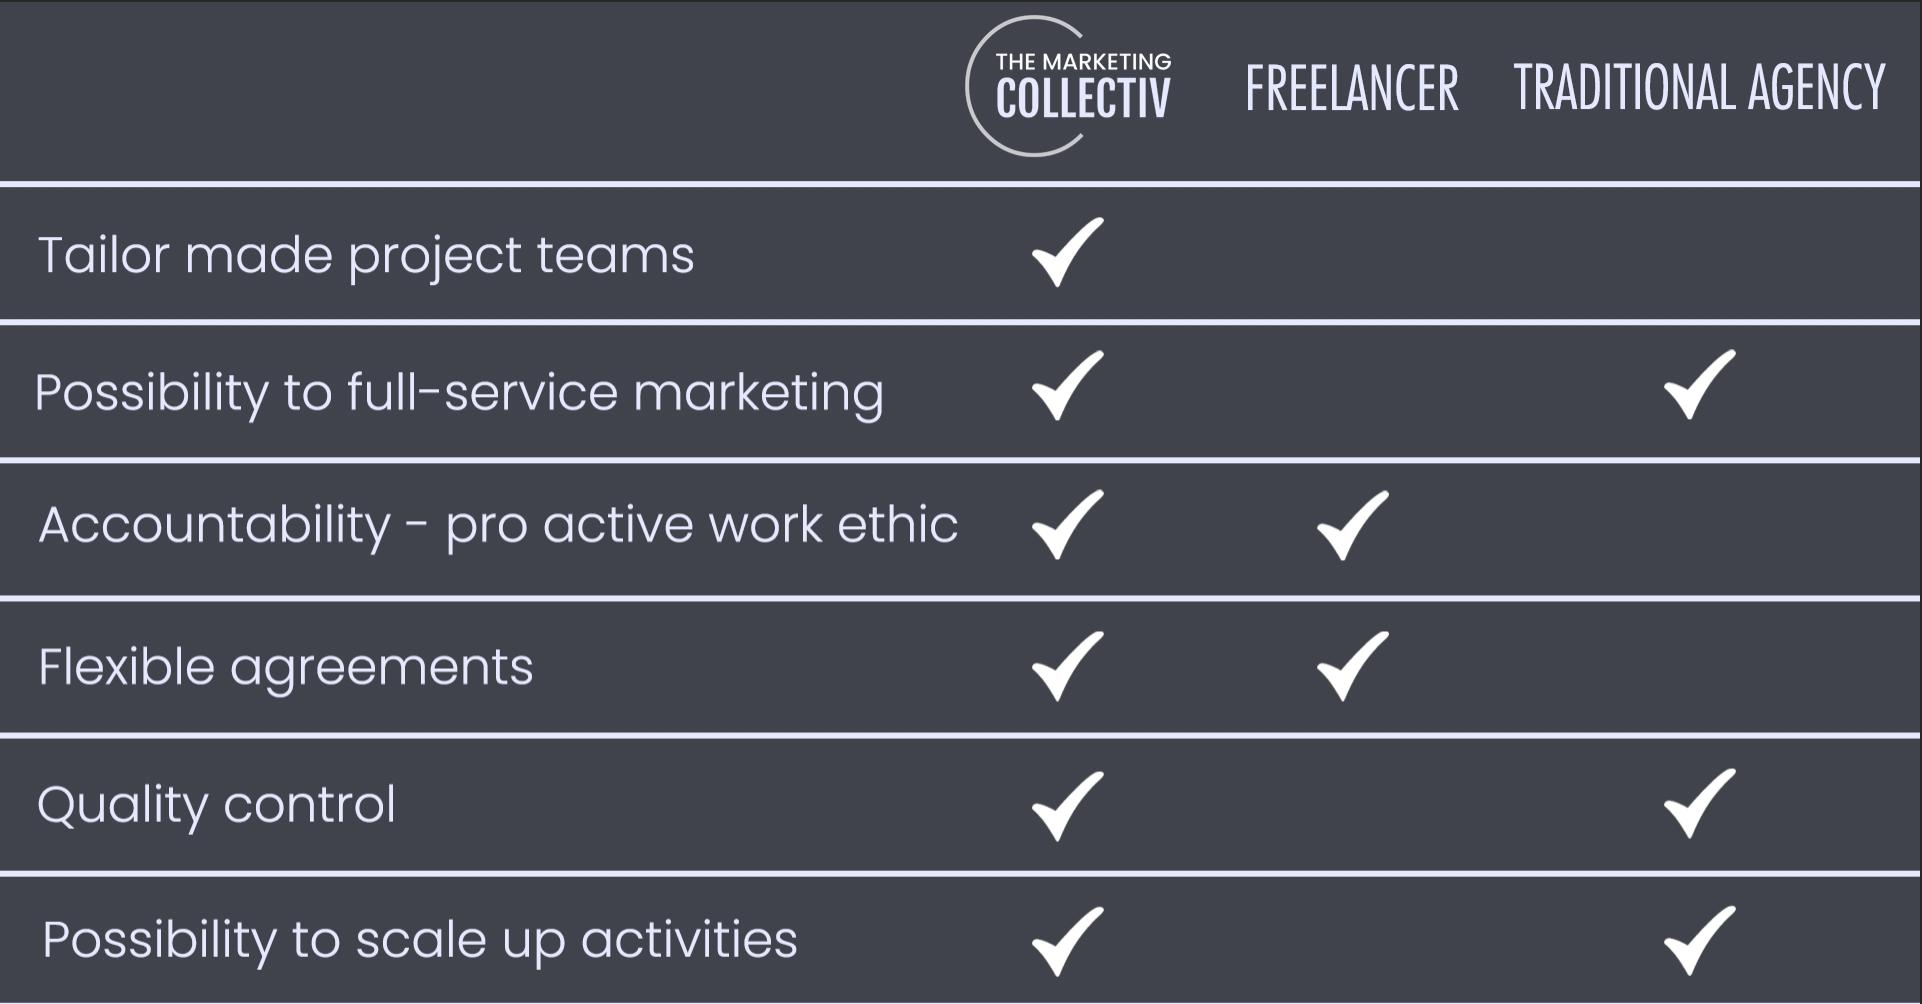 TheMarketingCollectiv_vs_freelance_vs_agency